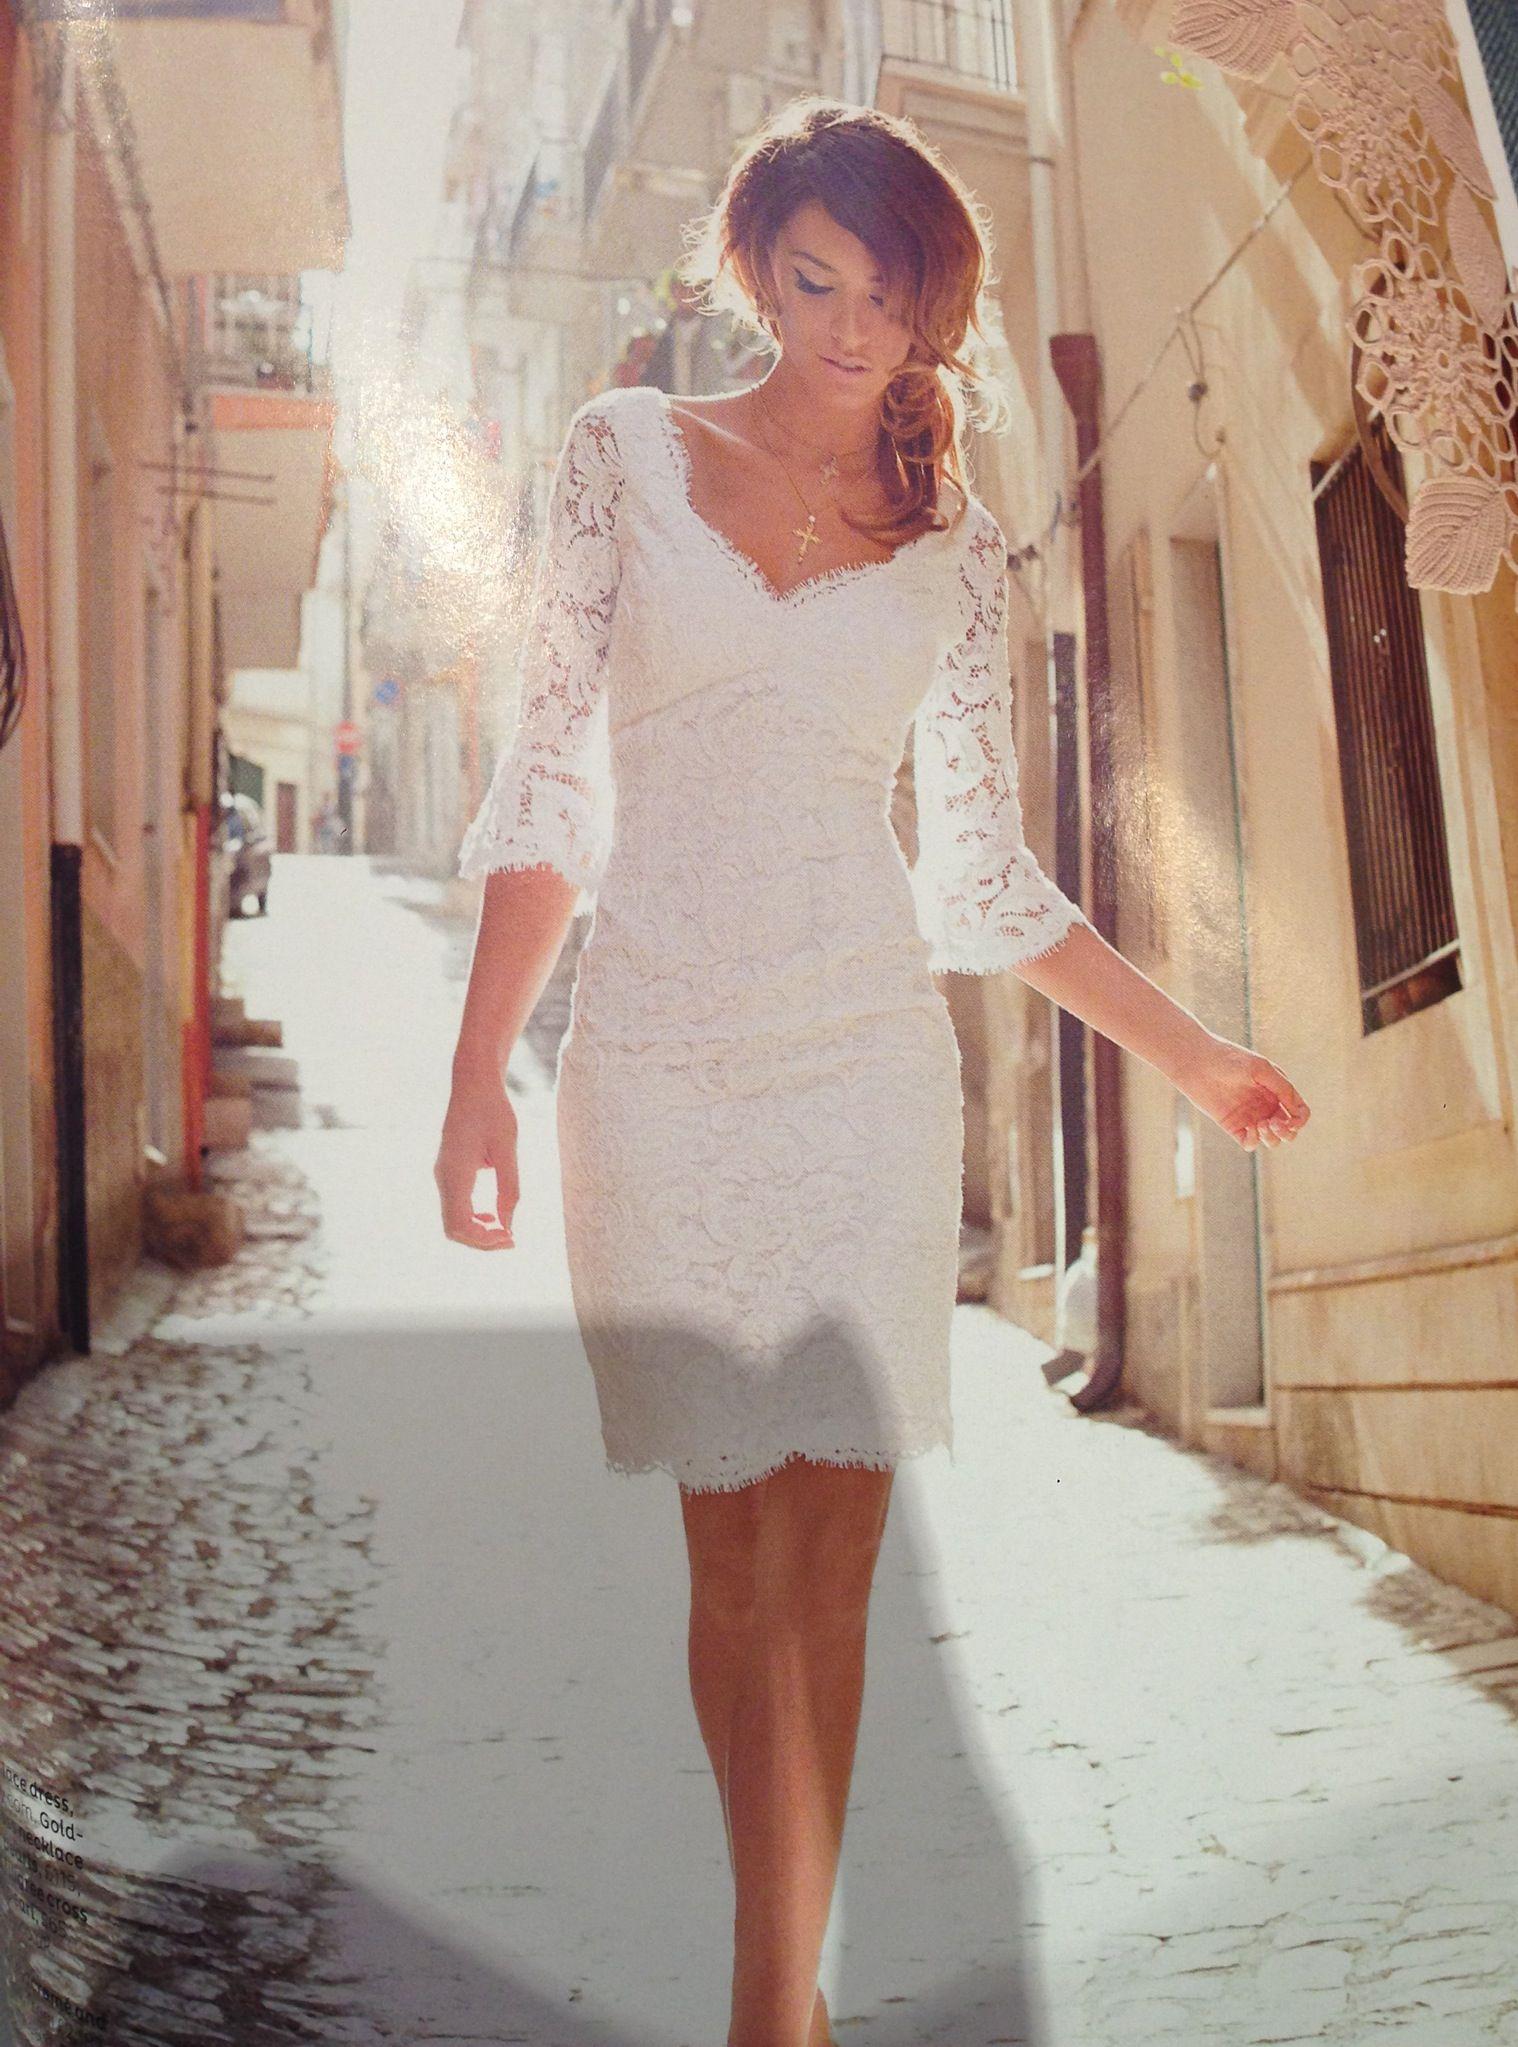 Pin By Adriana Monroy On Boda Simple Wedding Dress Short Courthouse Wedding Dress Short Civil Wedding Dresses [ 2047 x 1518 Pixel ]